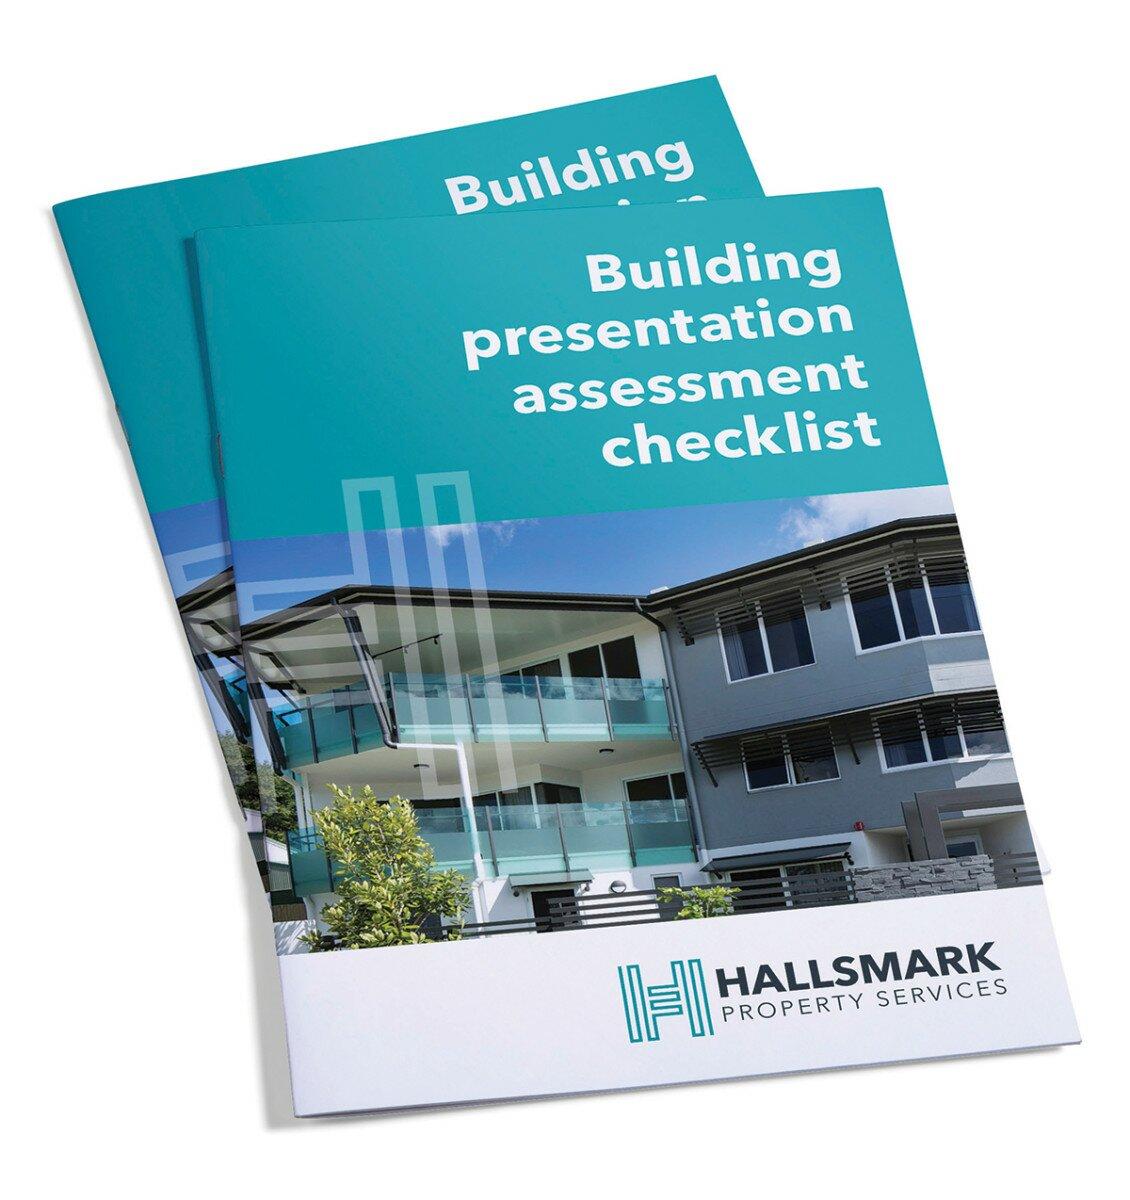 Profile Magazine Online Hallsmark3 Home Improvement